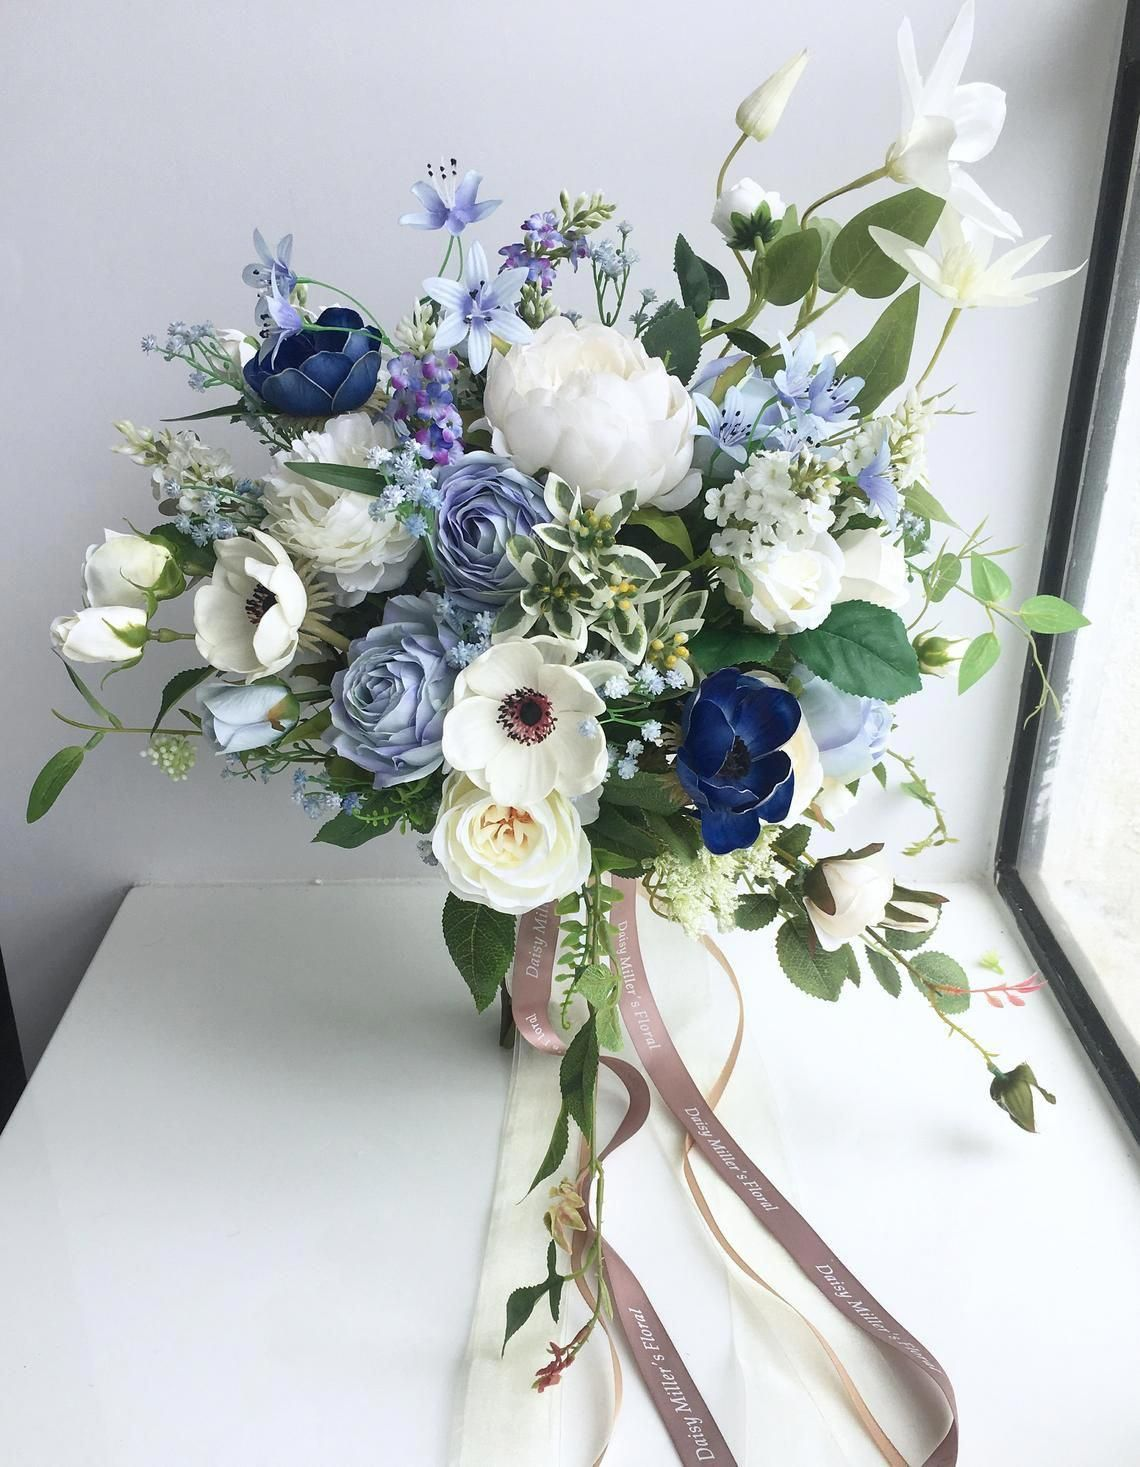 60 Roses LIGHT BLUE Silk Wedding Bouquet Flowers Bridal Centerpieces